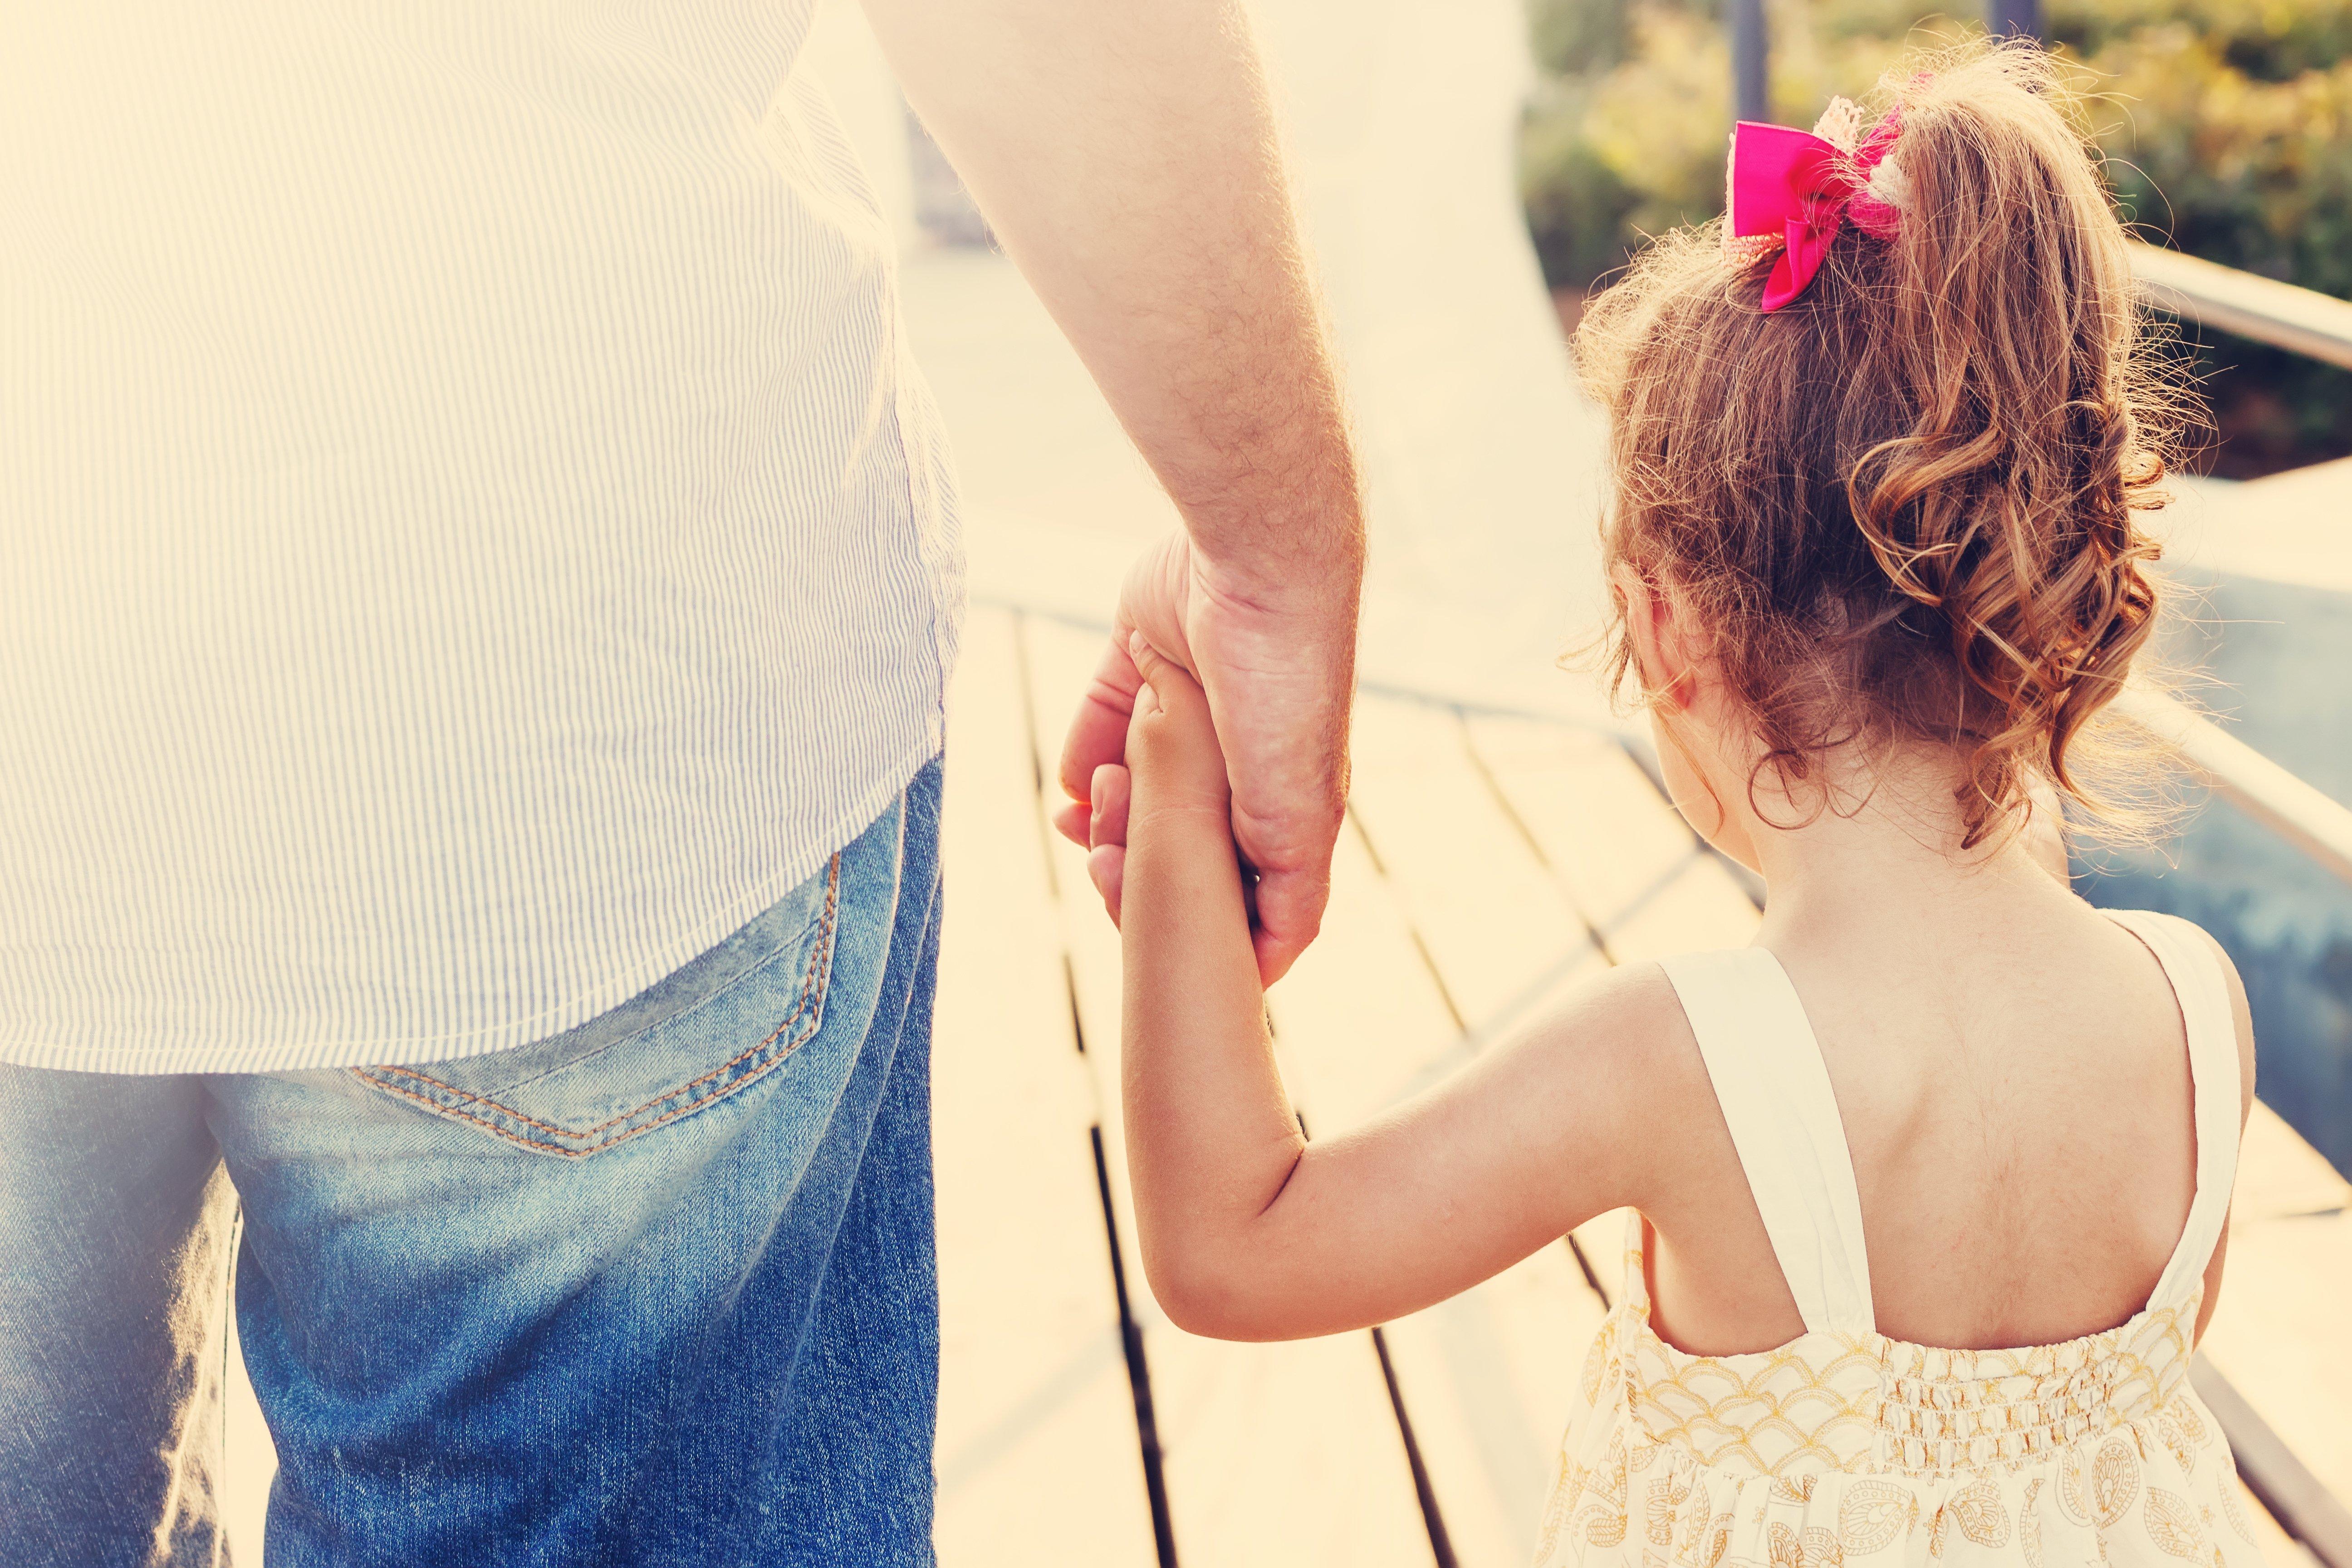 Padre e hija tomados de la mano. Fuente: Shutterstock